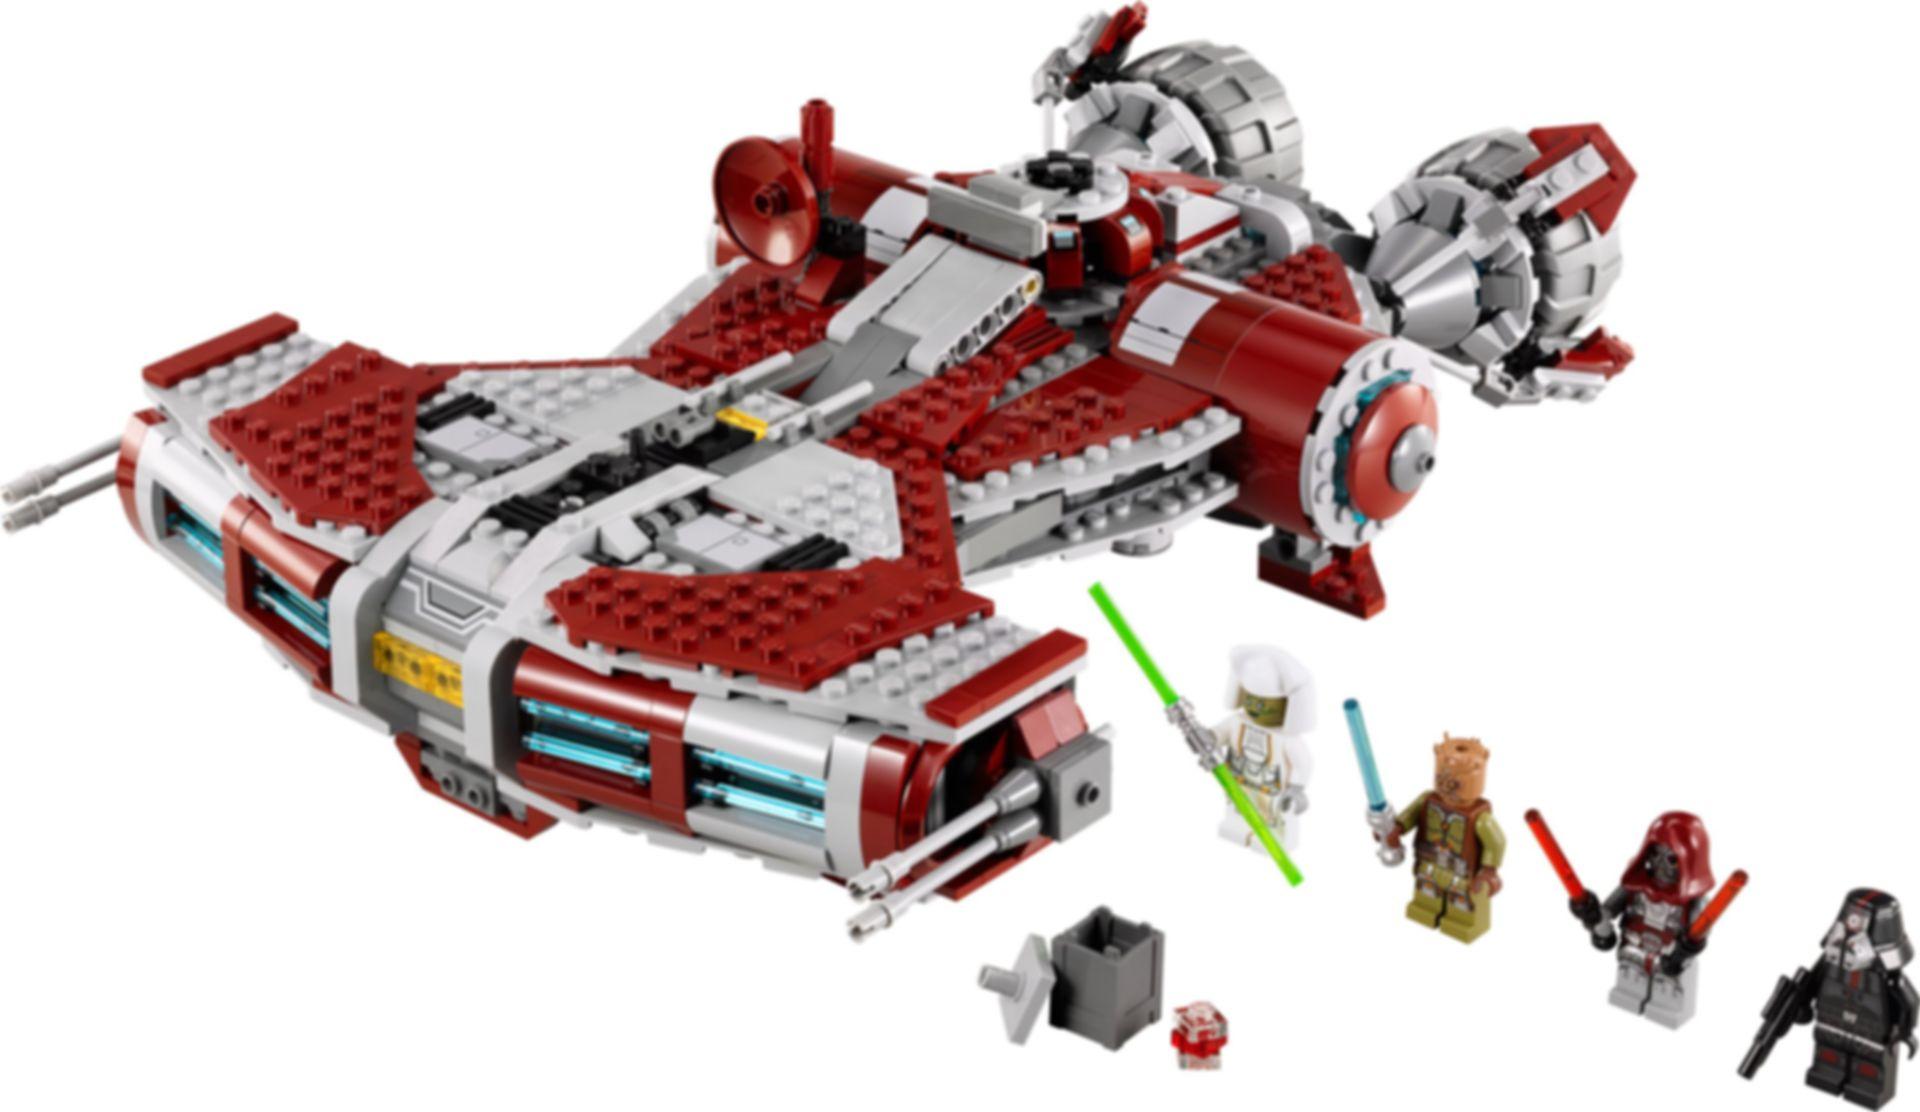 LEGO® Star Wars Jedi Defender-class Cruiser components